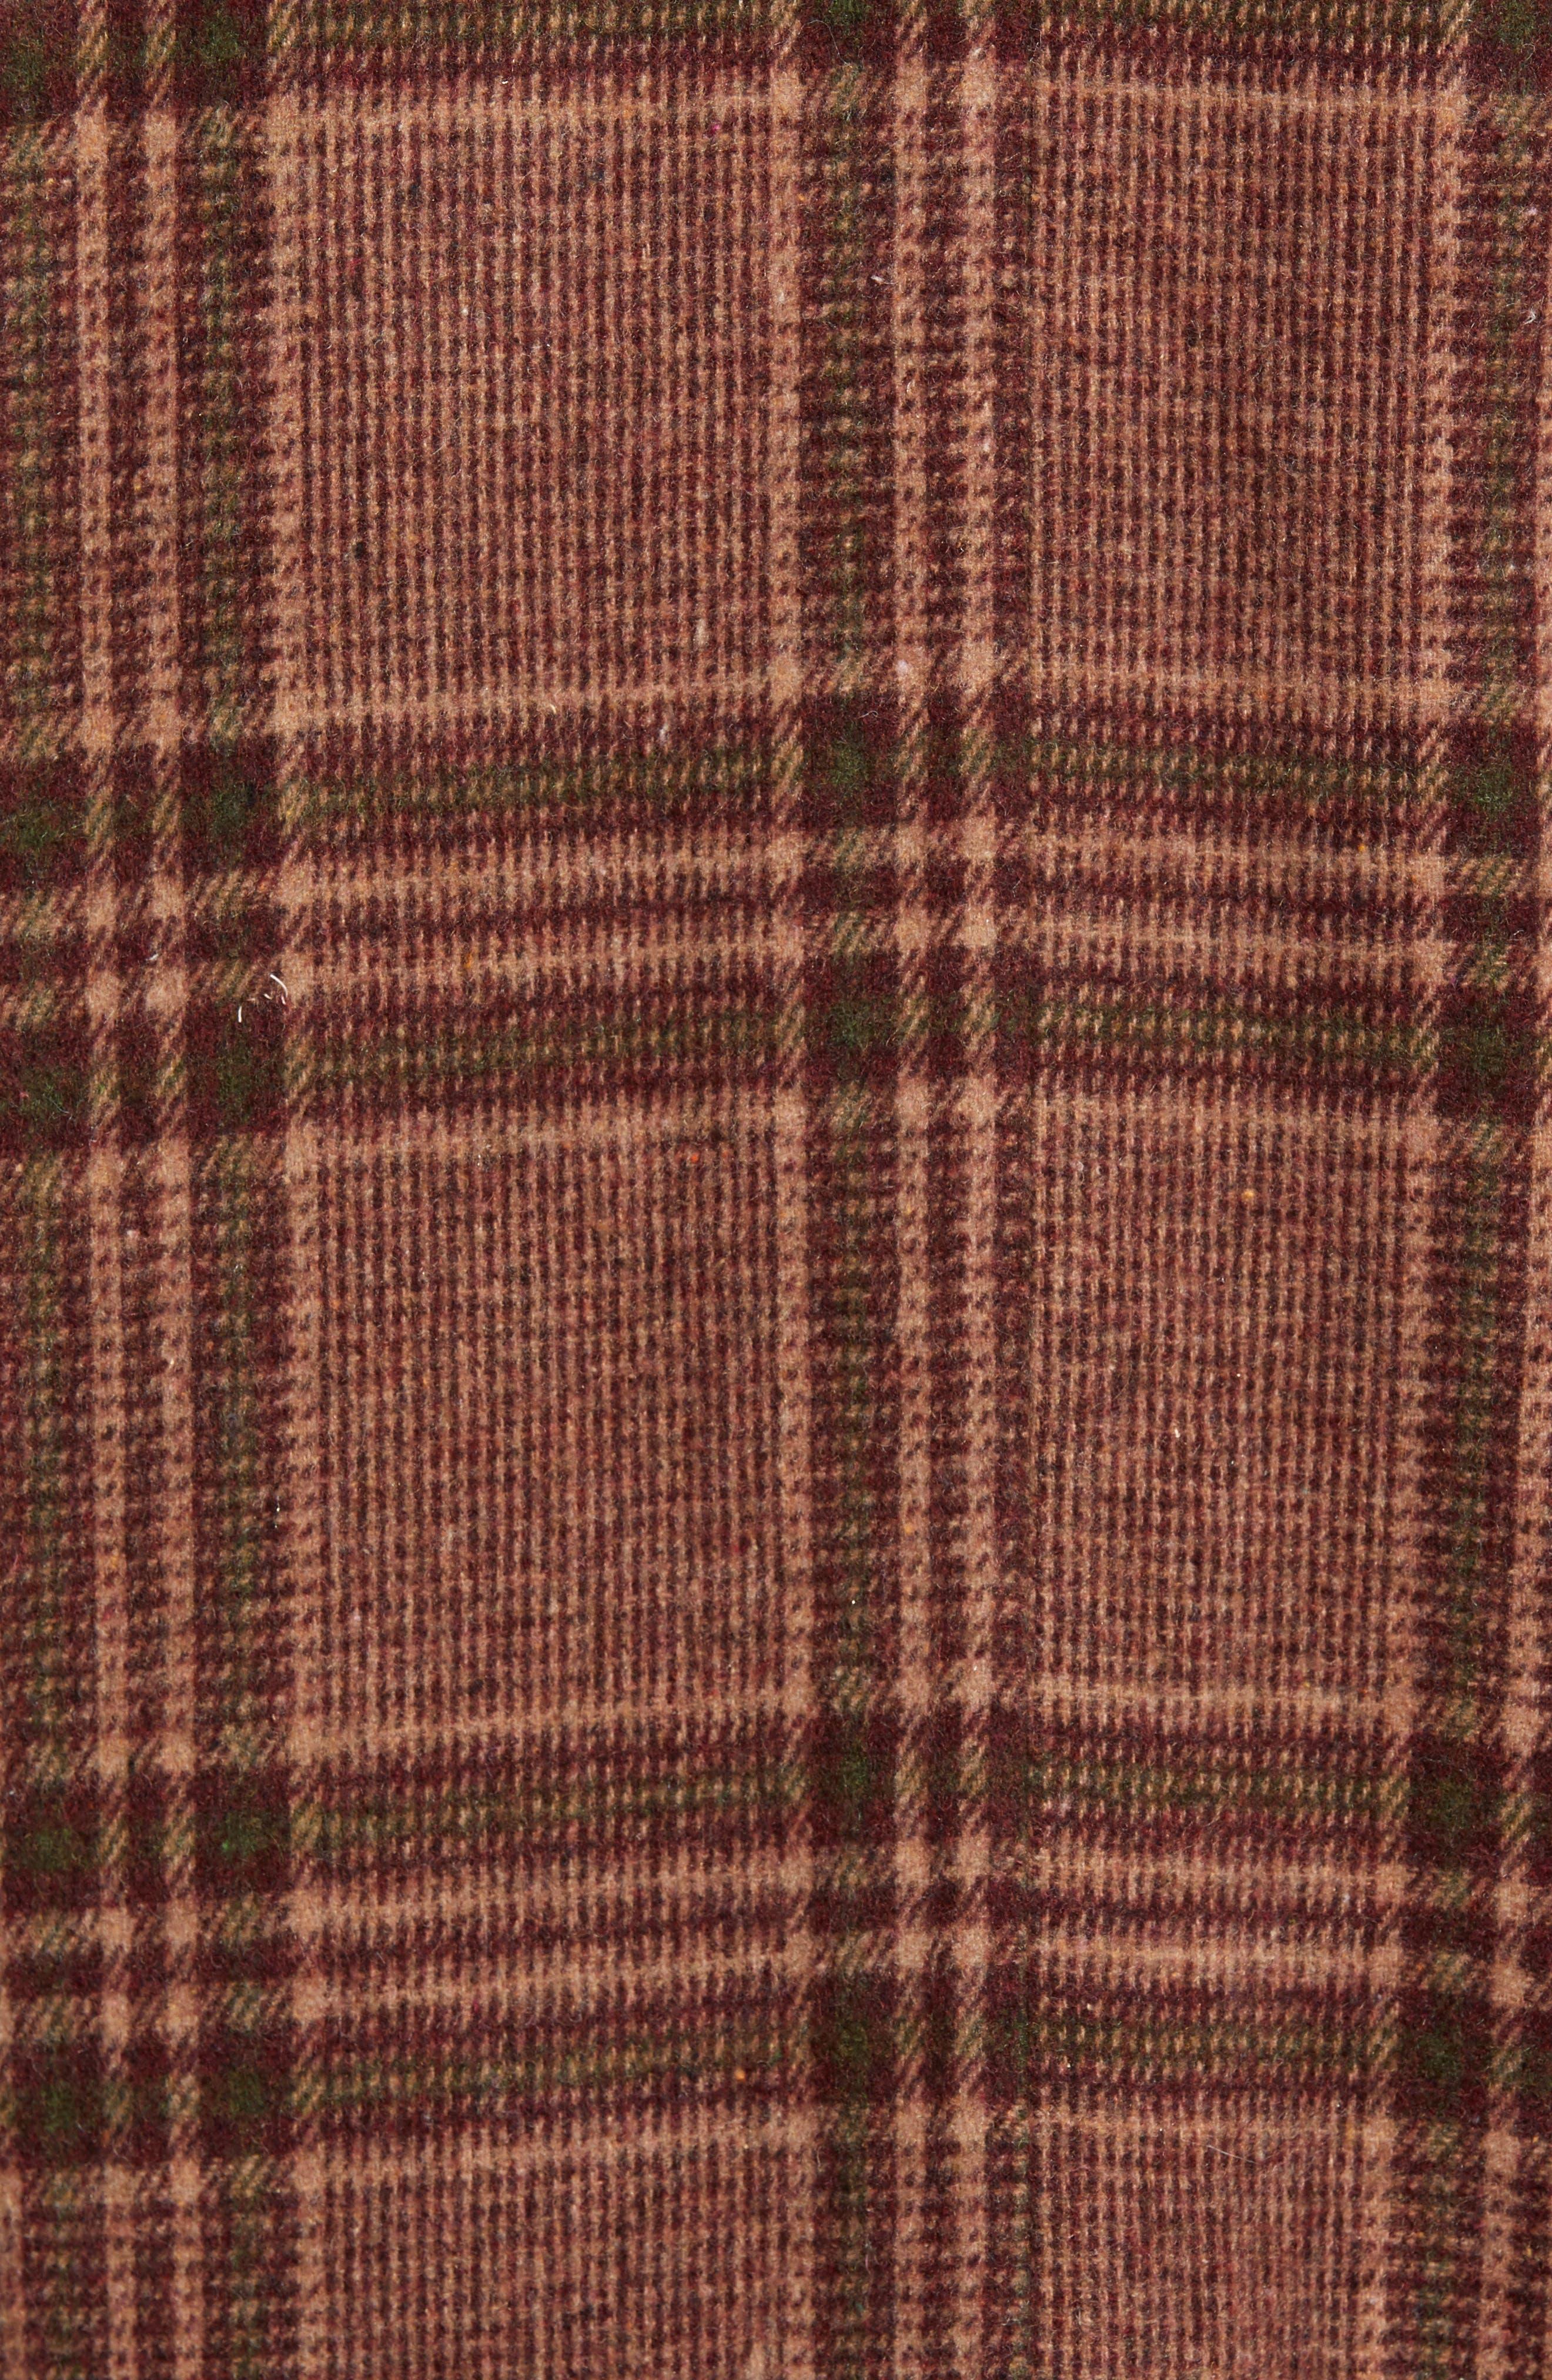 Faux Shearling Trim Plaid Jacket,                             Alternate thumbnail 7, color,                             BROWN PLAID